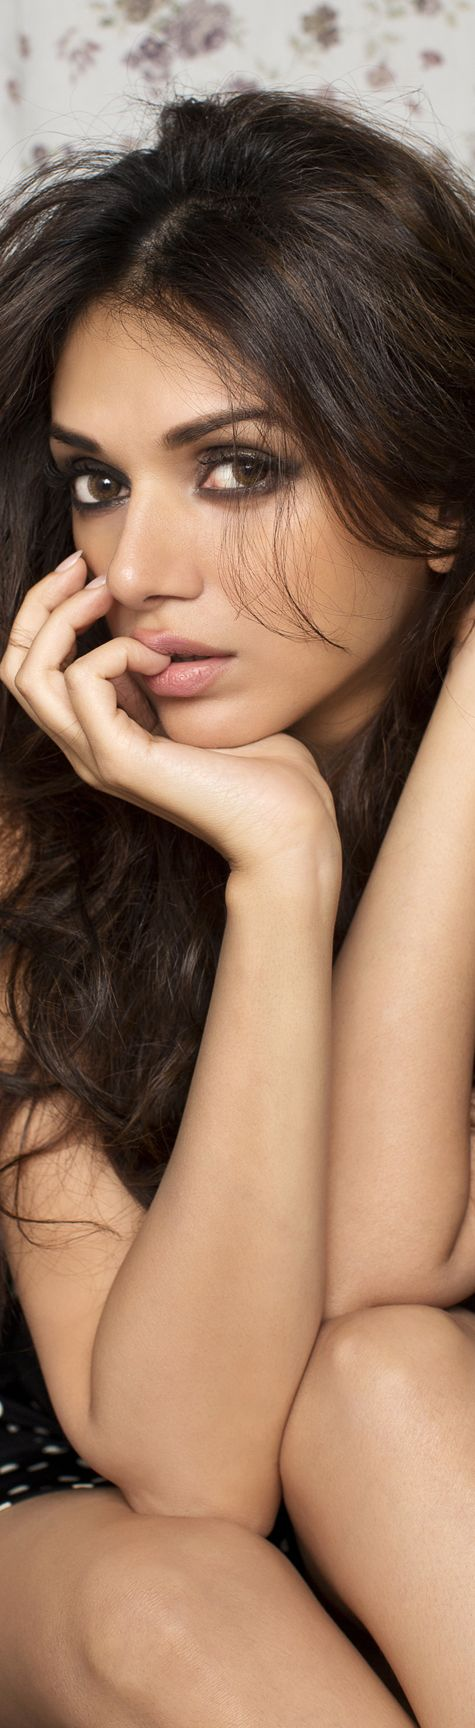 € m i s s x {the girl every girl hates yet wishes to be❤️} Aditi Rao Hydari